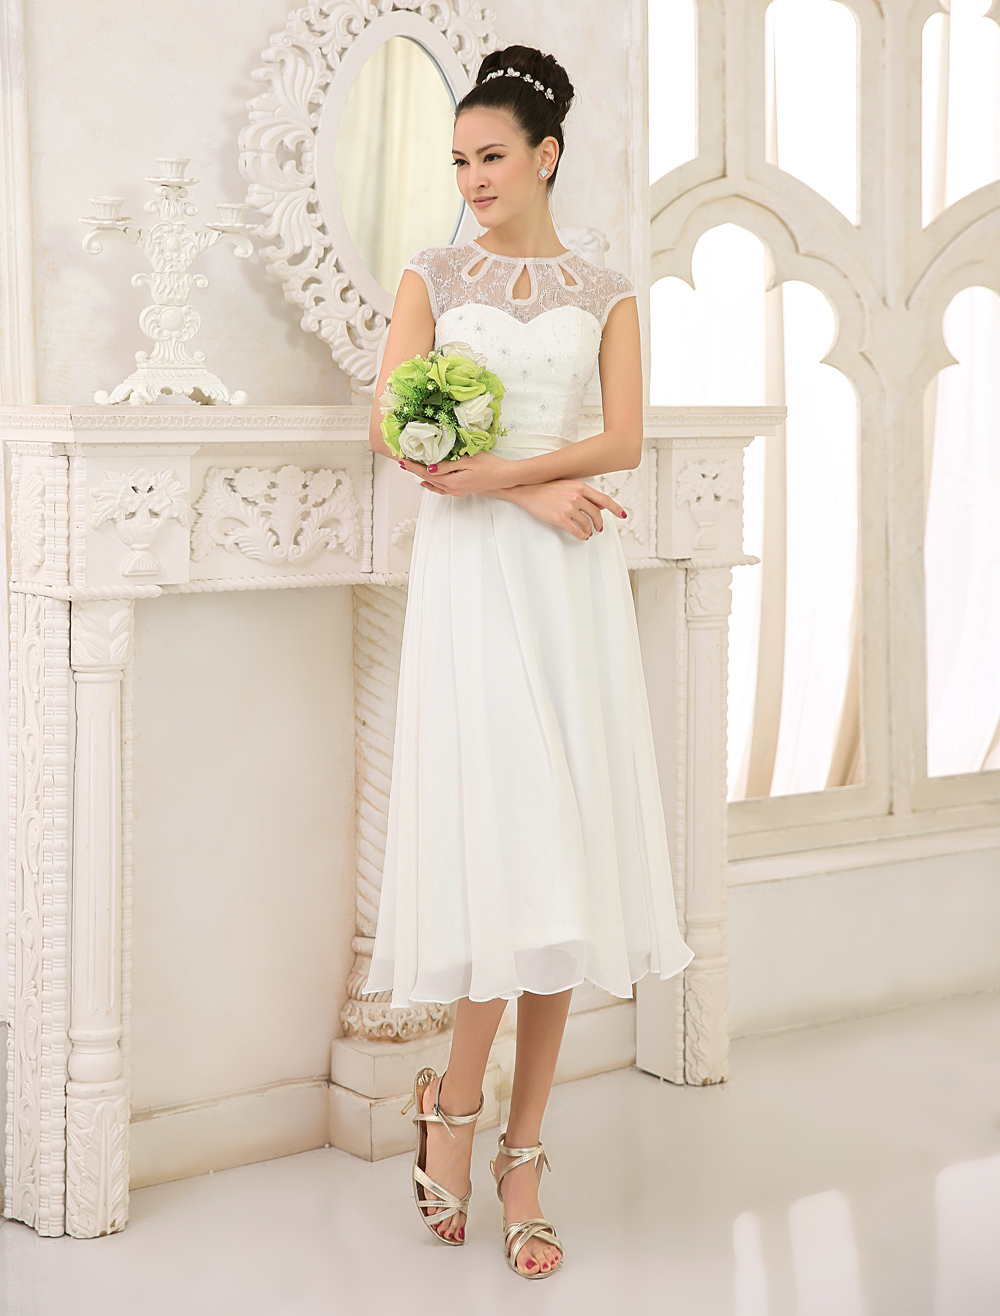 Ivory Lace Chiffon Beach Wedding Dress with Beaded Milanoo